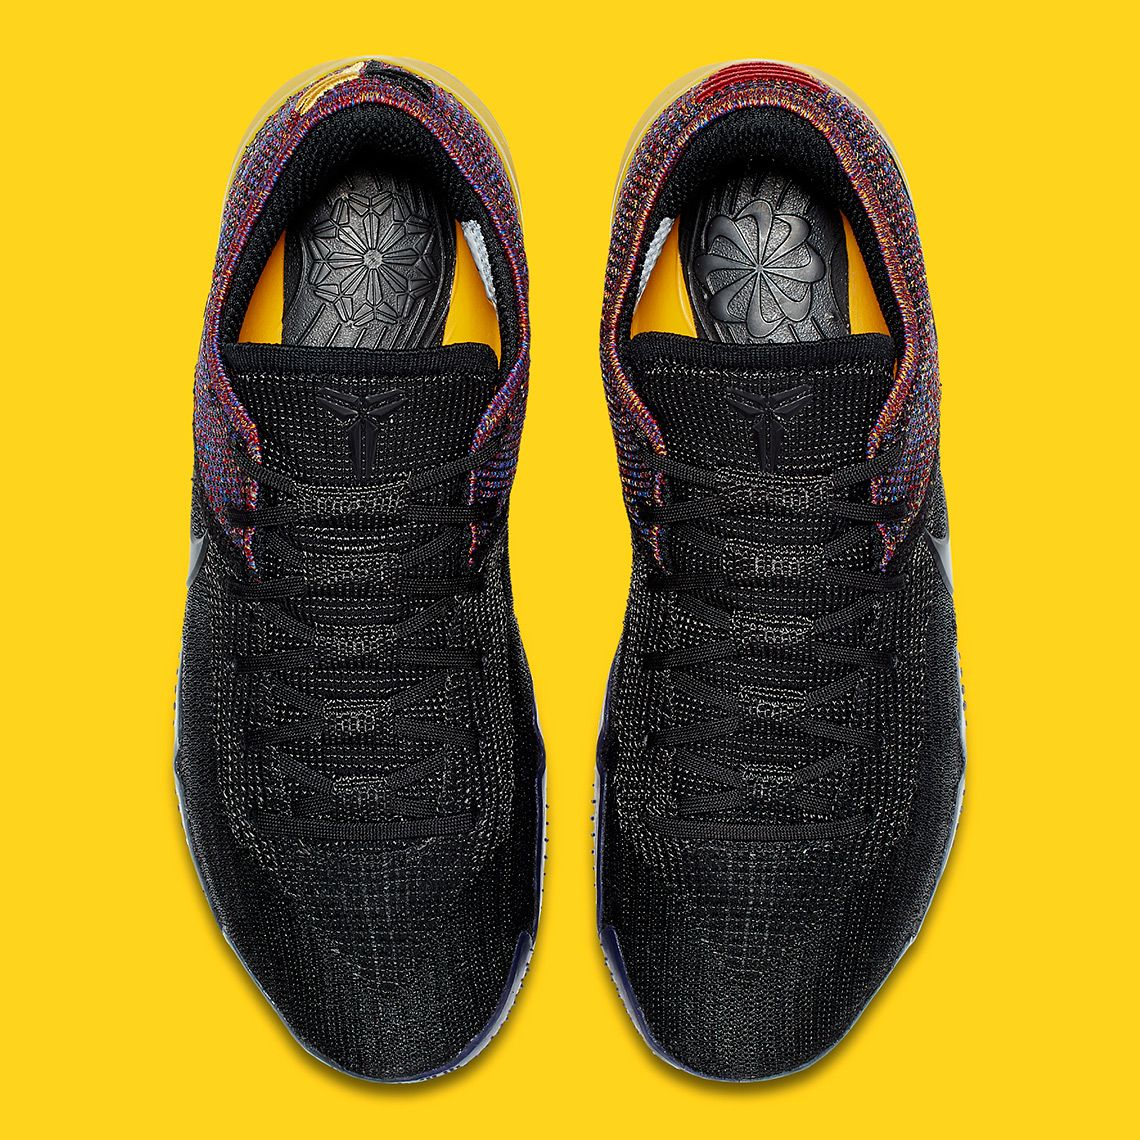 a10678d6e7e8 Nike Kobe AD NXT 360 Black Hyper Pink Multi-Color AQ1087-002